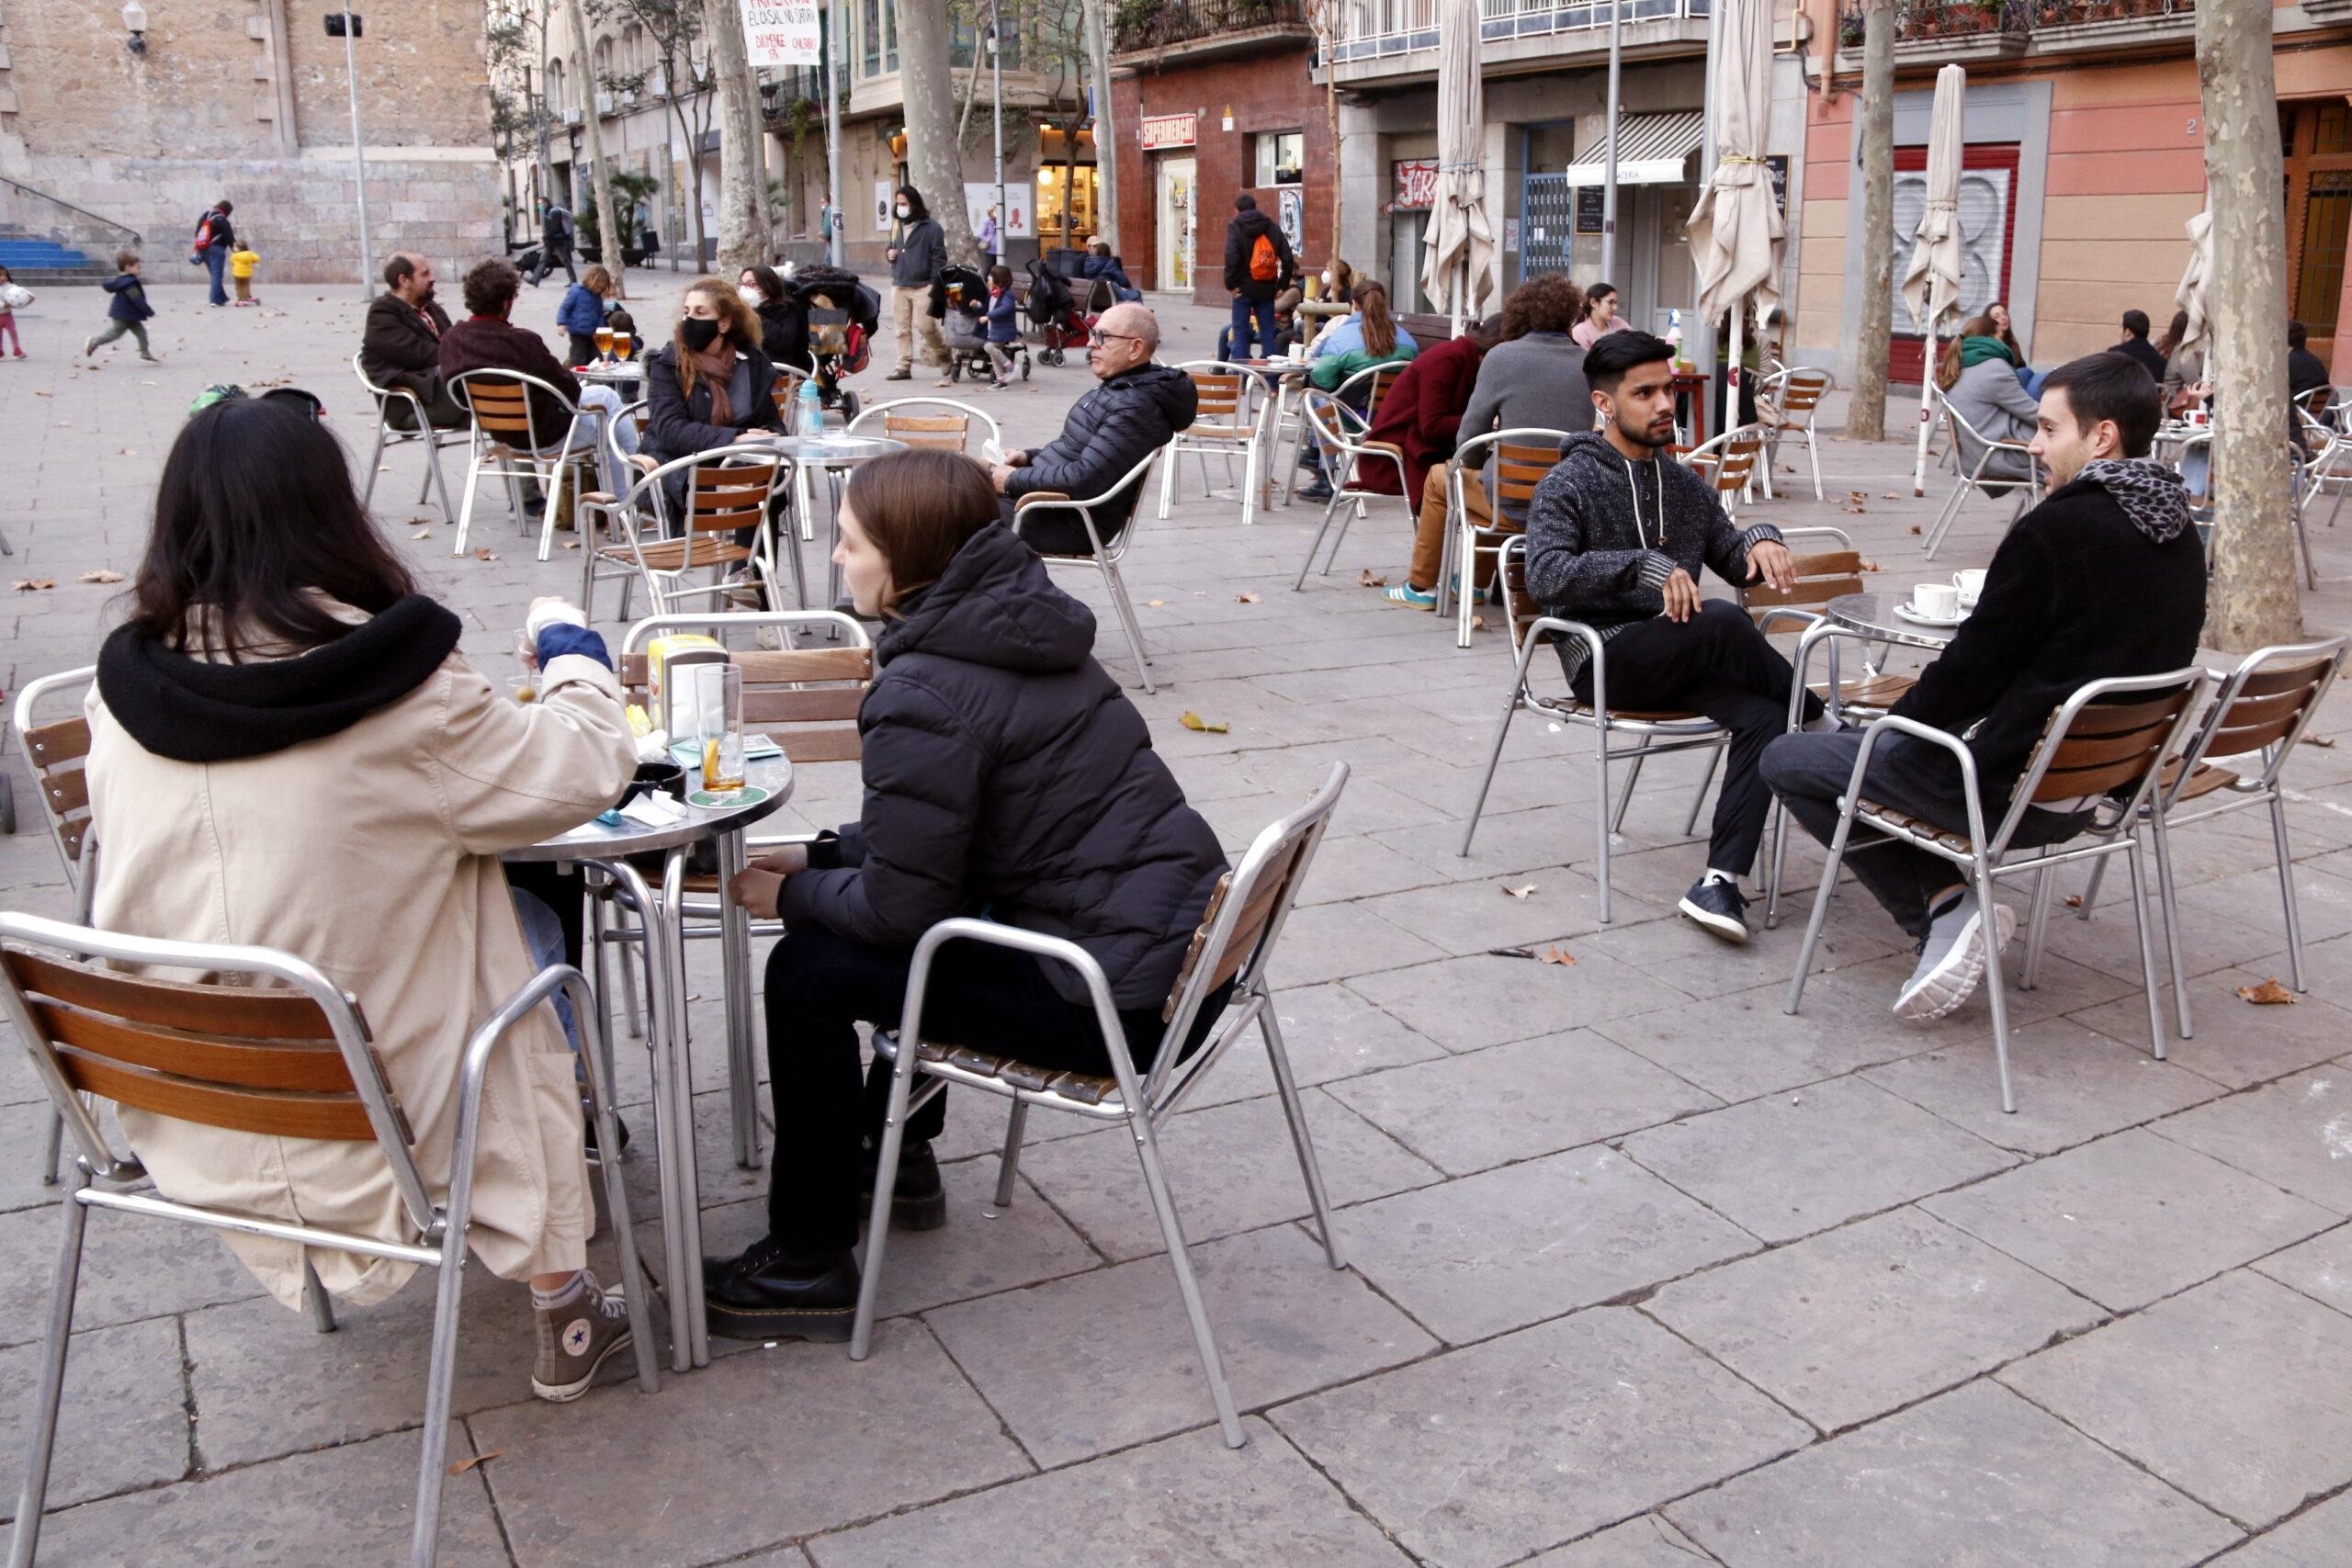 Una terrassa de bar plena a la plaça de la Virreina de Barcelona | ACN